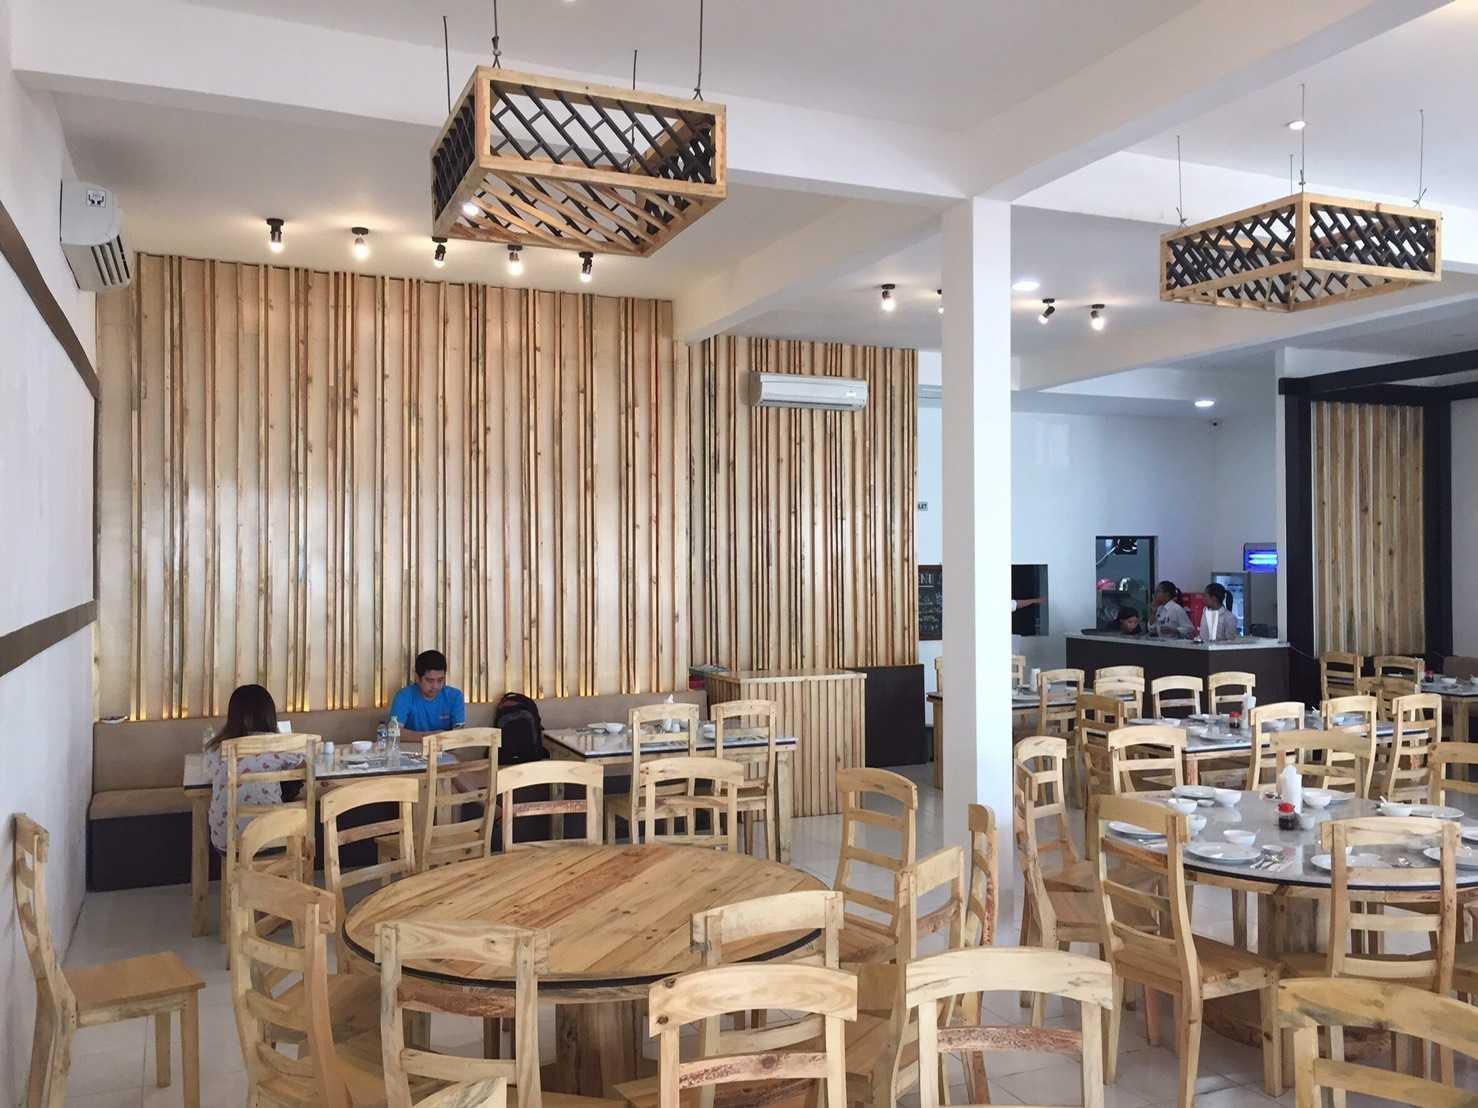 Alima Studio Uncle Chong Restaurant Jl. By Pass Ngurah Rai No.402, Sanur, Denpasar Sel., Bali, 80228, Indonesia Jl. By Pass Ngurah Rai No.402, Sanur, Denpasar Sel., Bali, 80228, Indonesia Alima-Studio-Uncle-Chong-Restaurant  61866